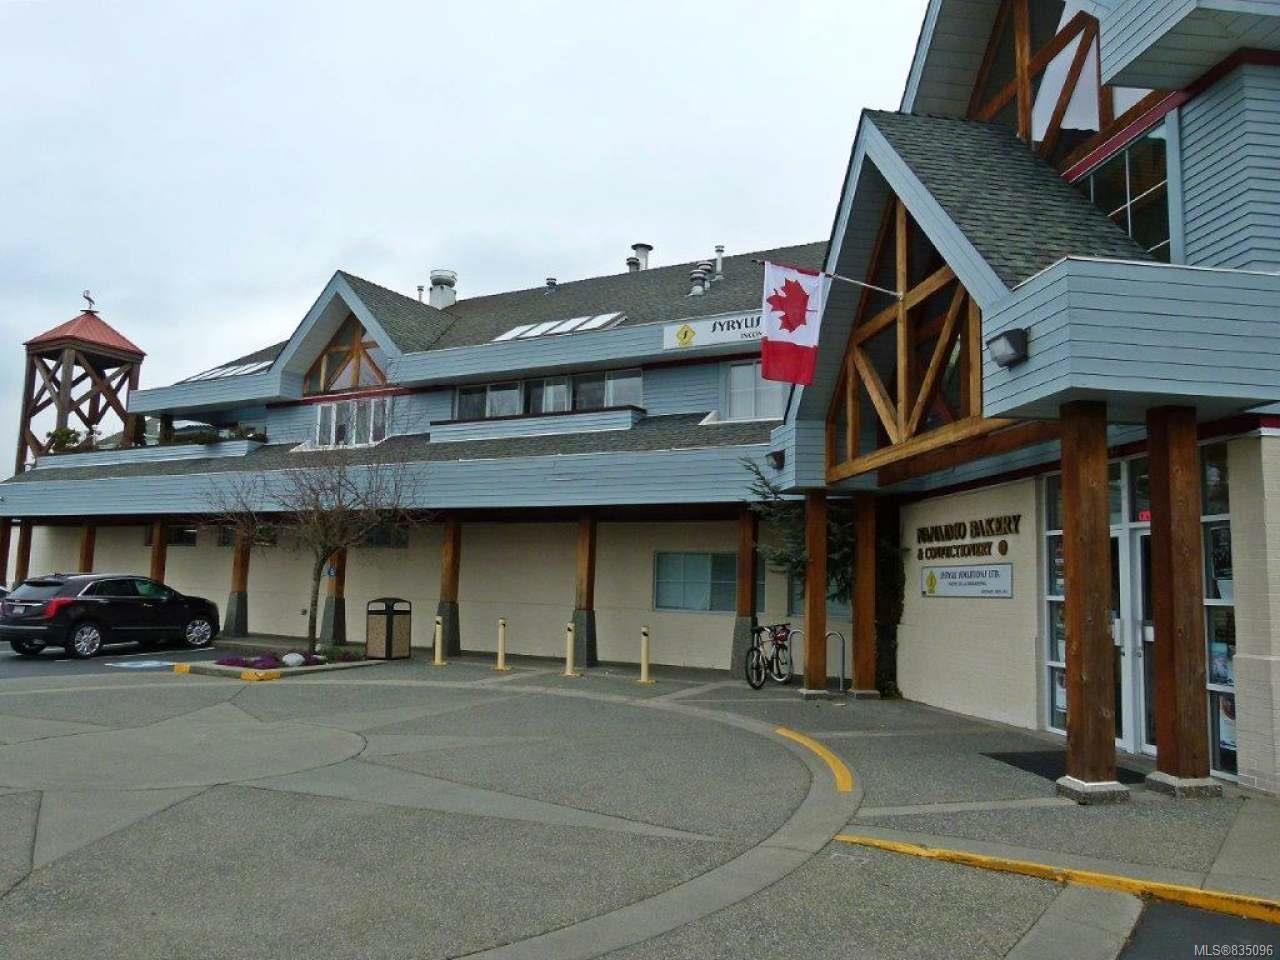 Photo 6: Photos: 2025 Bowen Rd in NANAIMO: Na Central Nanaimo Mixed Use for sale (Nanaimo)  : MLS®# 835096